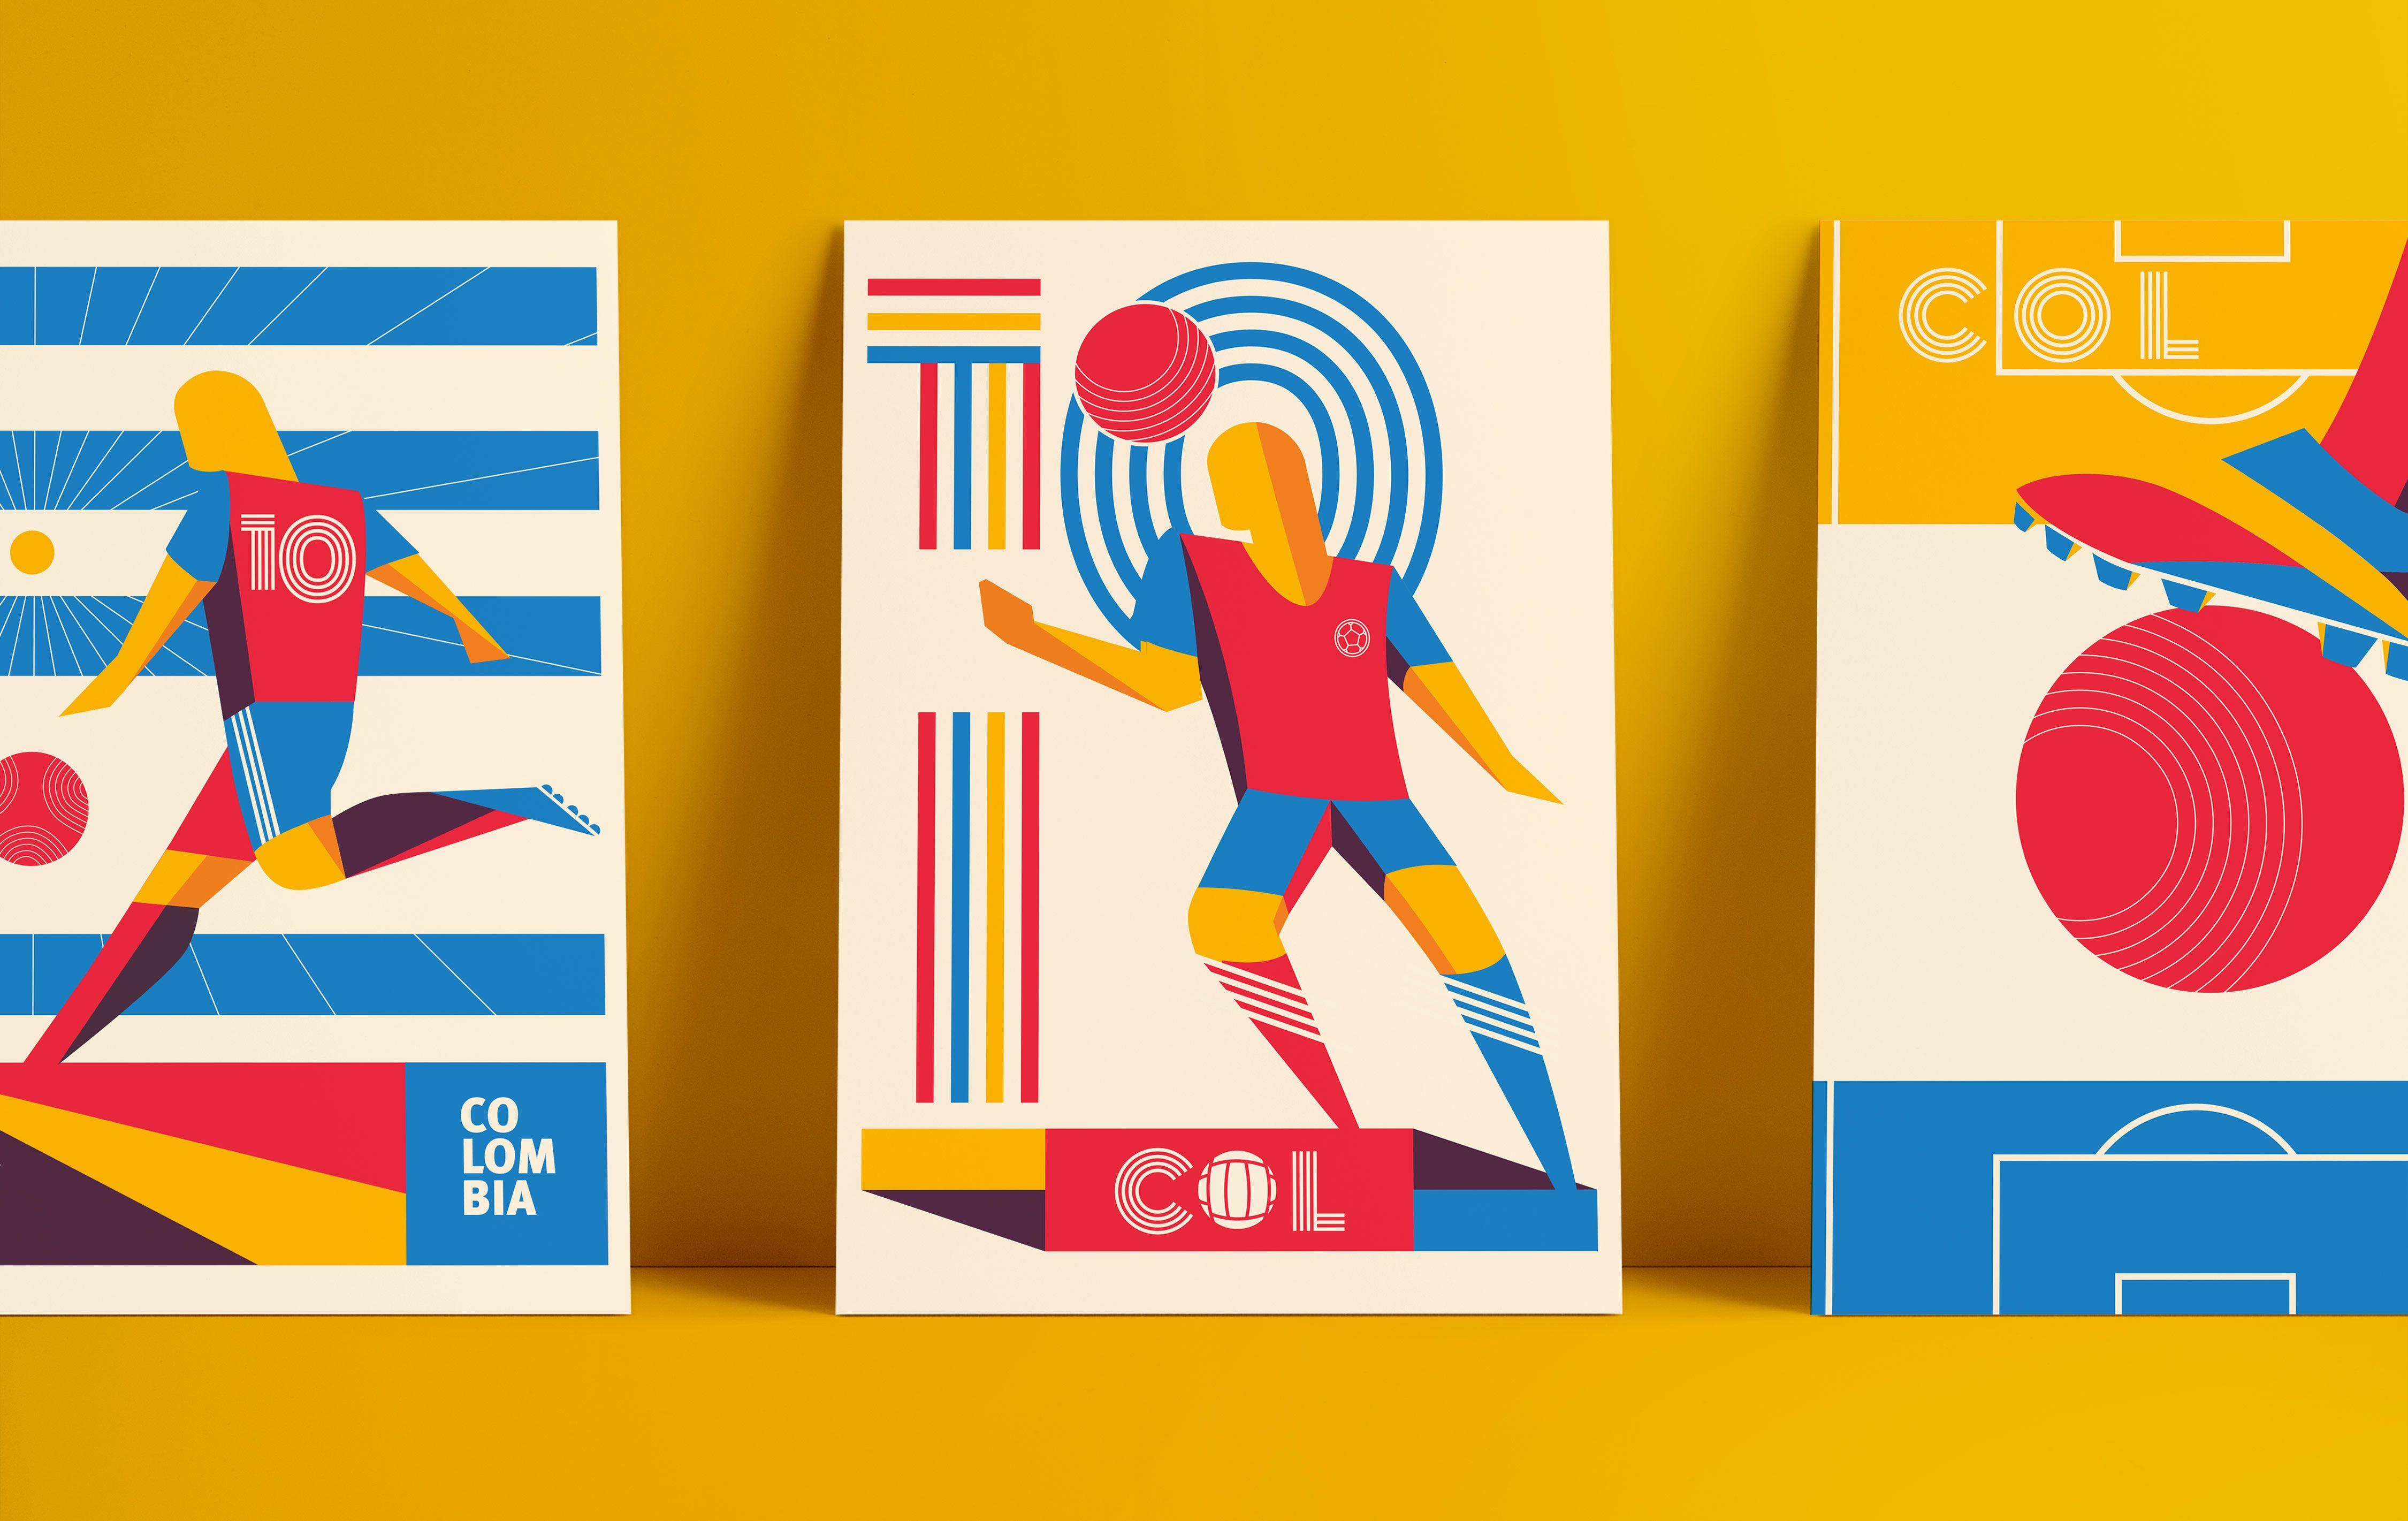 Sounders tee 2019 image by Daisy Fry Tech logos,